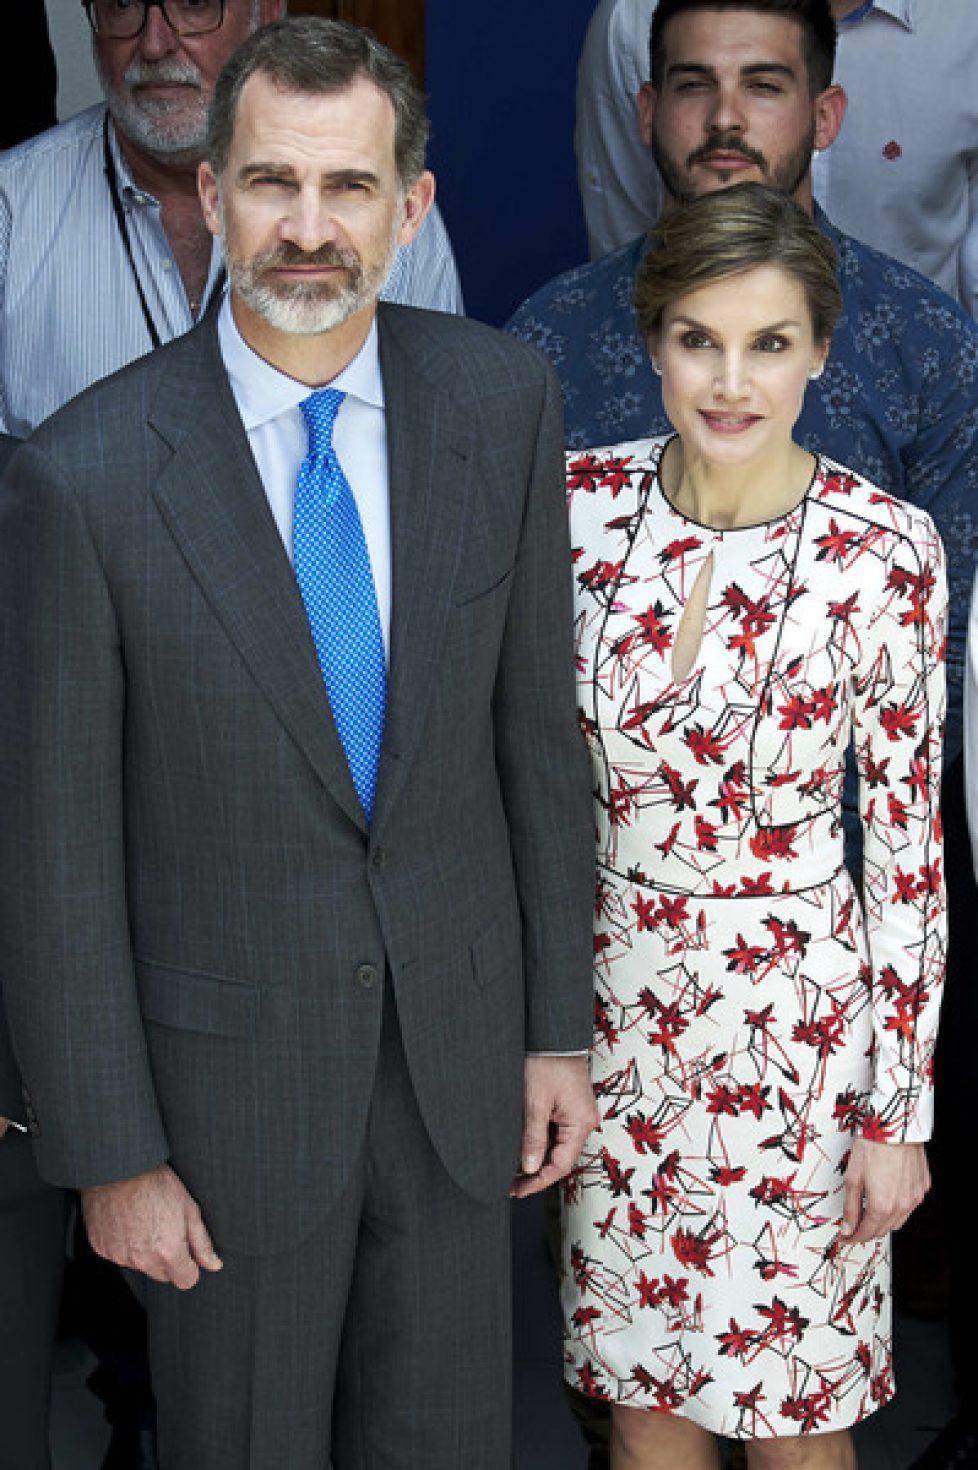 Spanish+Royals+Visit+Gran+Canaria+VONR3yvcPe3l